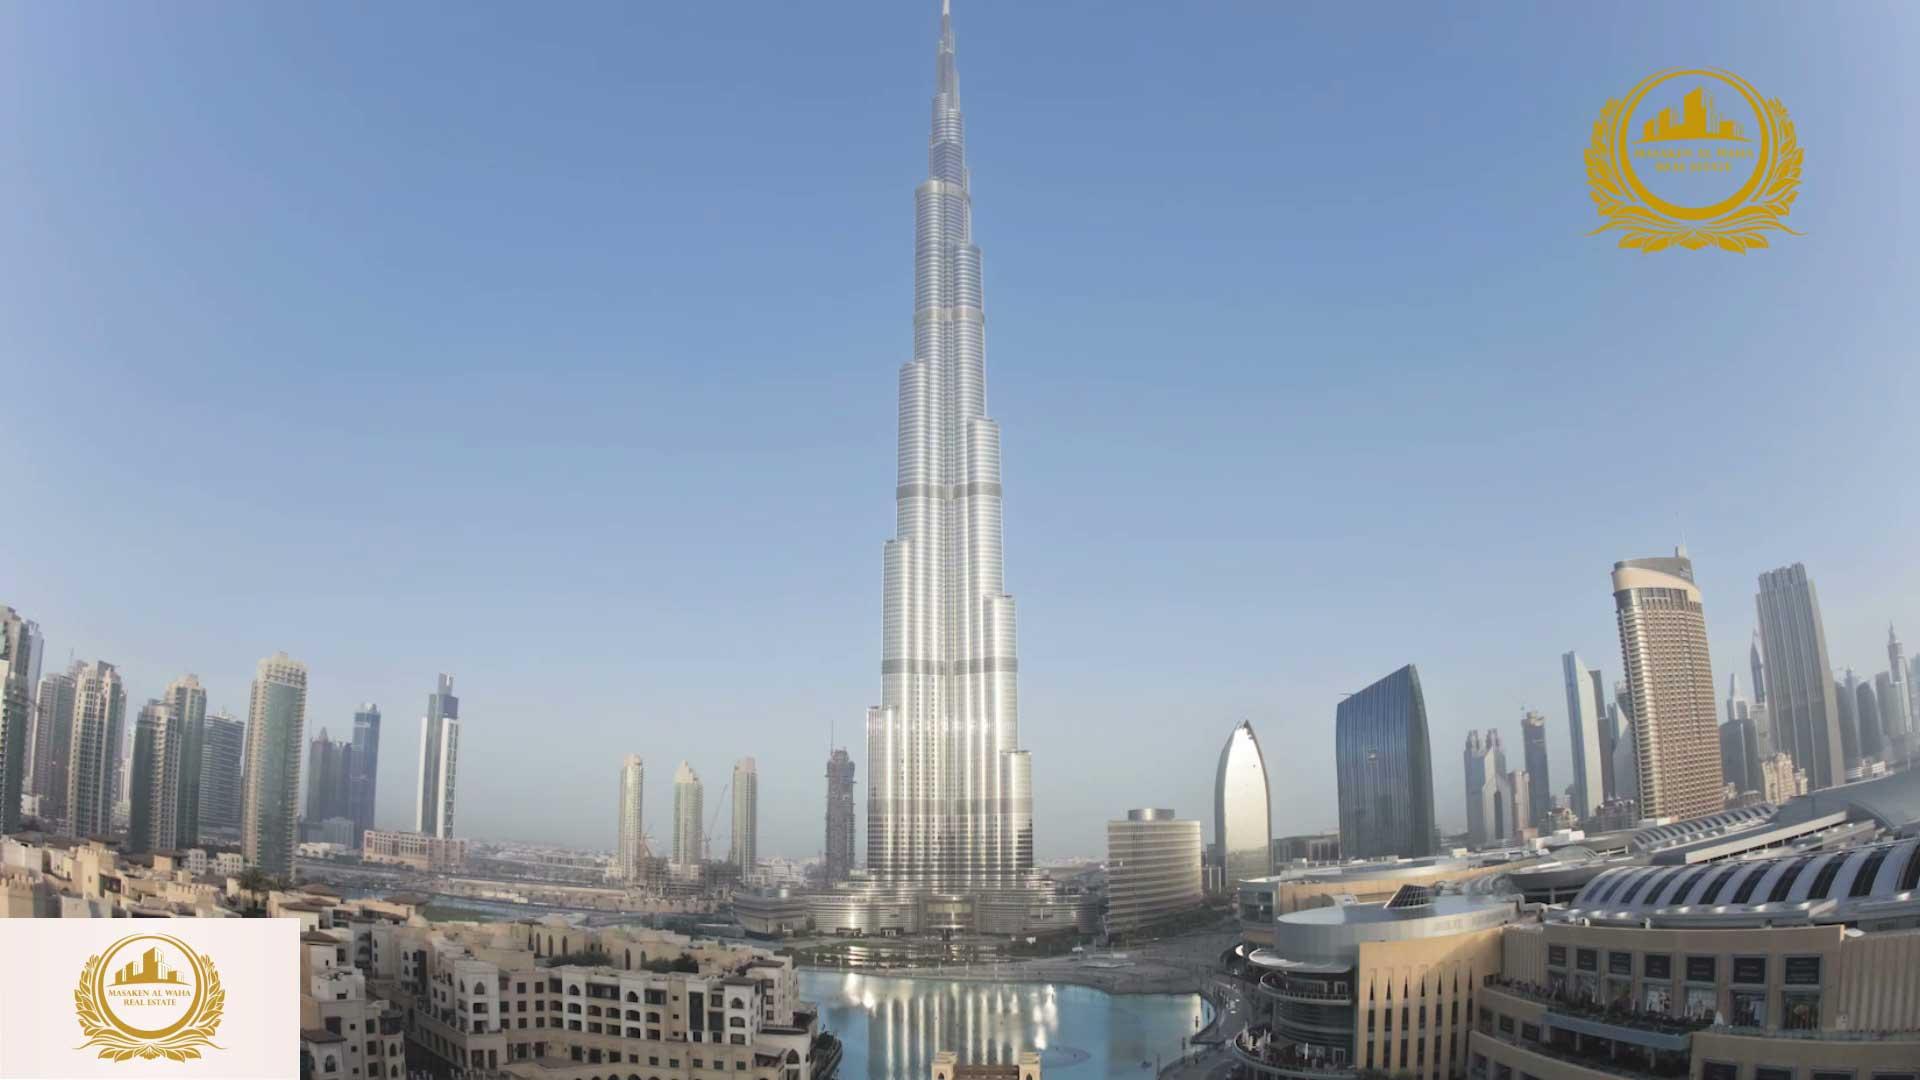 Masaken Al Waha Company Overview 1 |